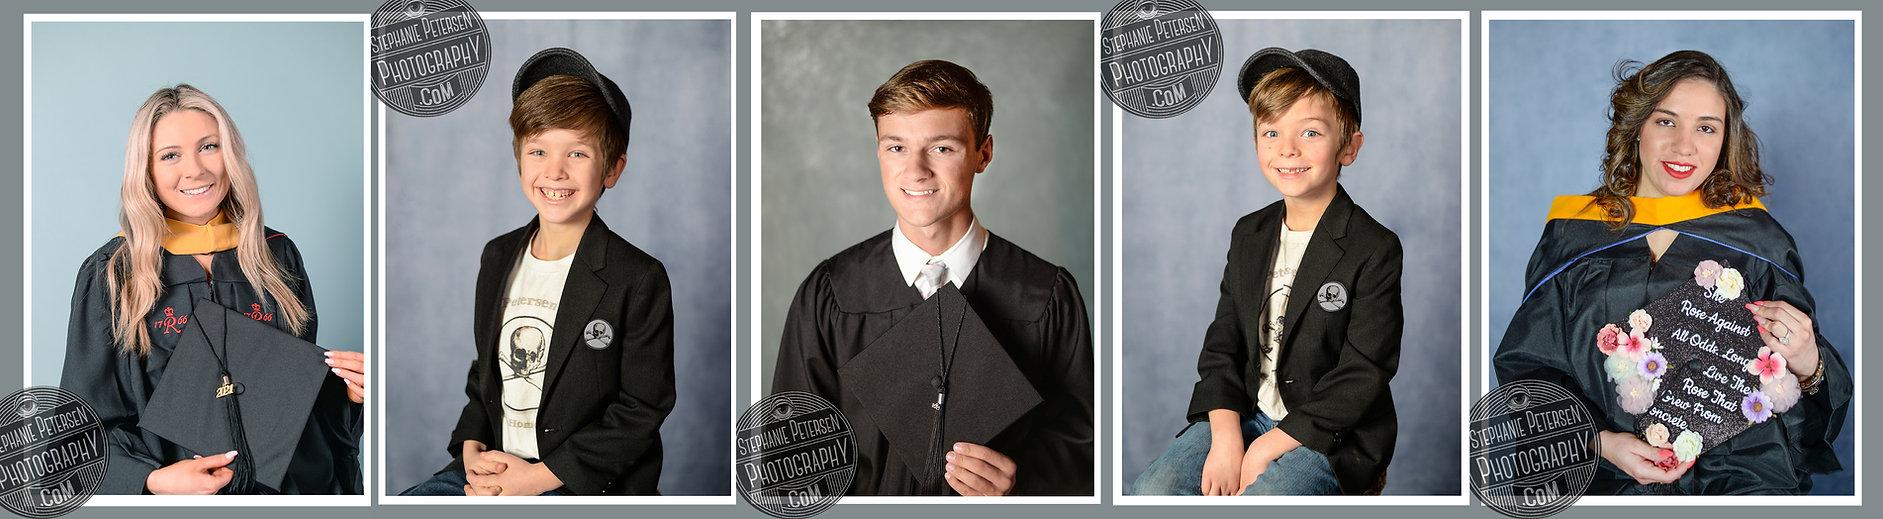 School Photos!